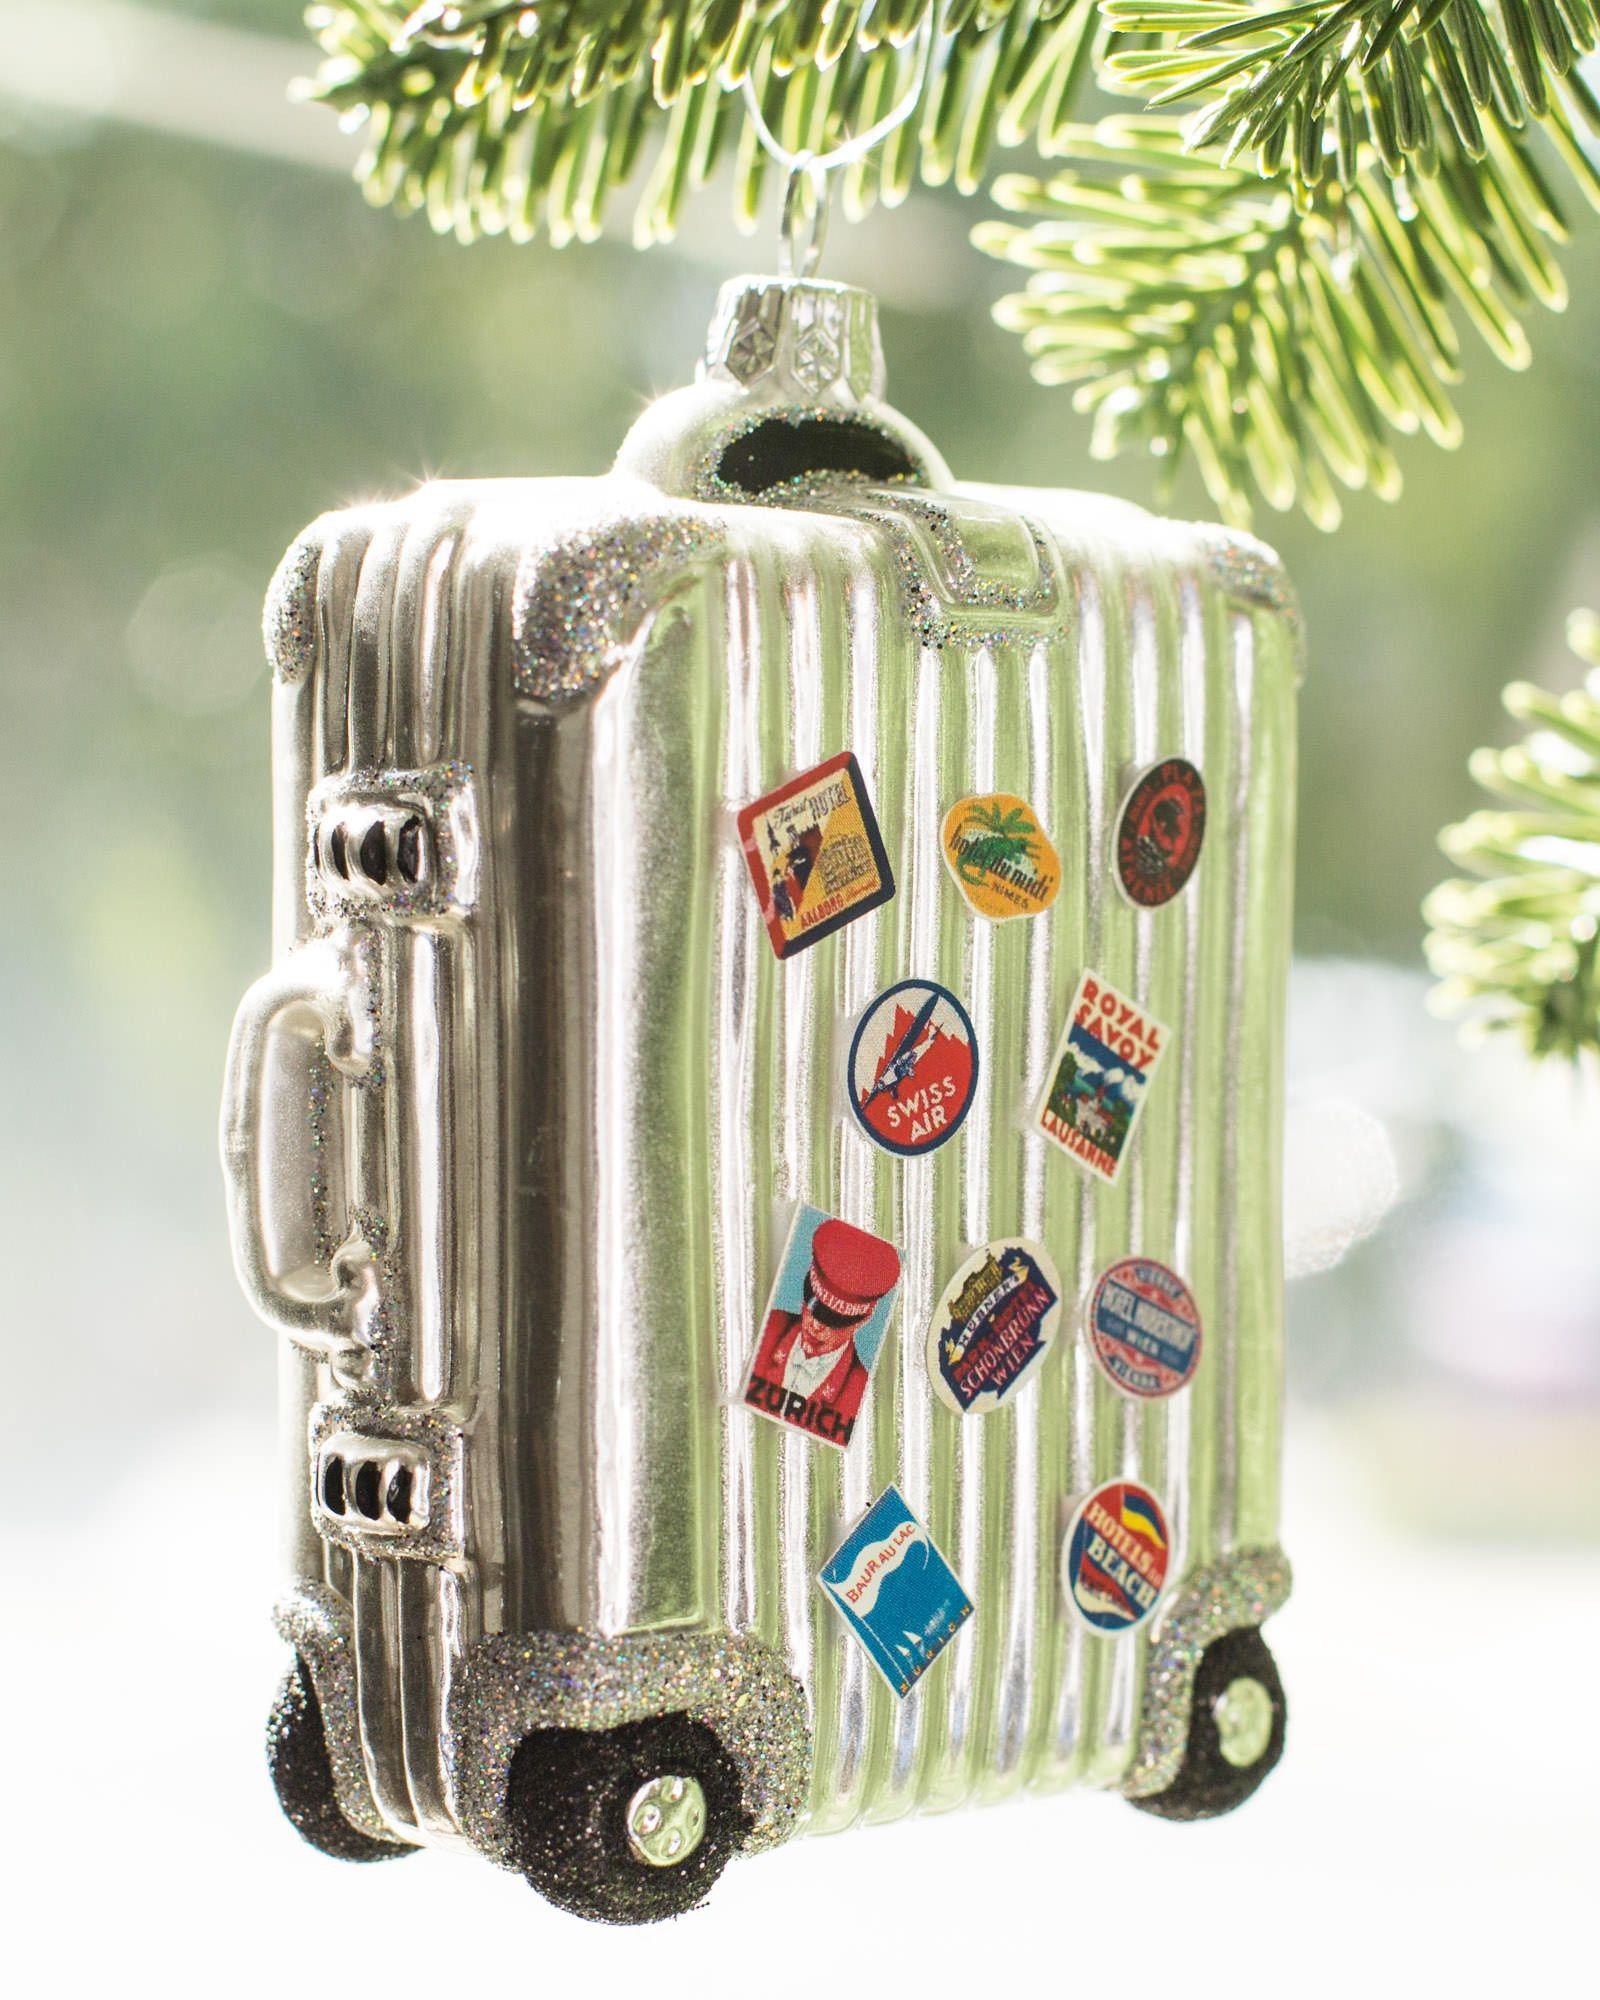 European Vintage Travel Glass Ornaments | Balsam Hill